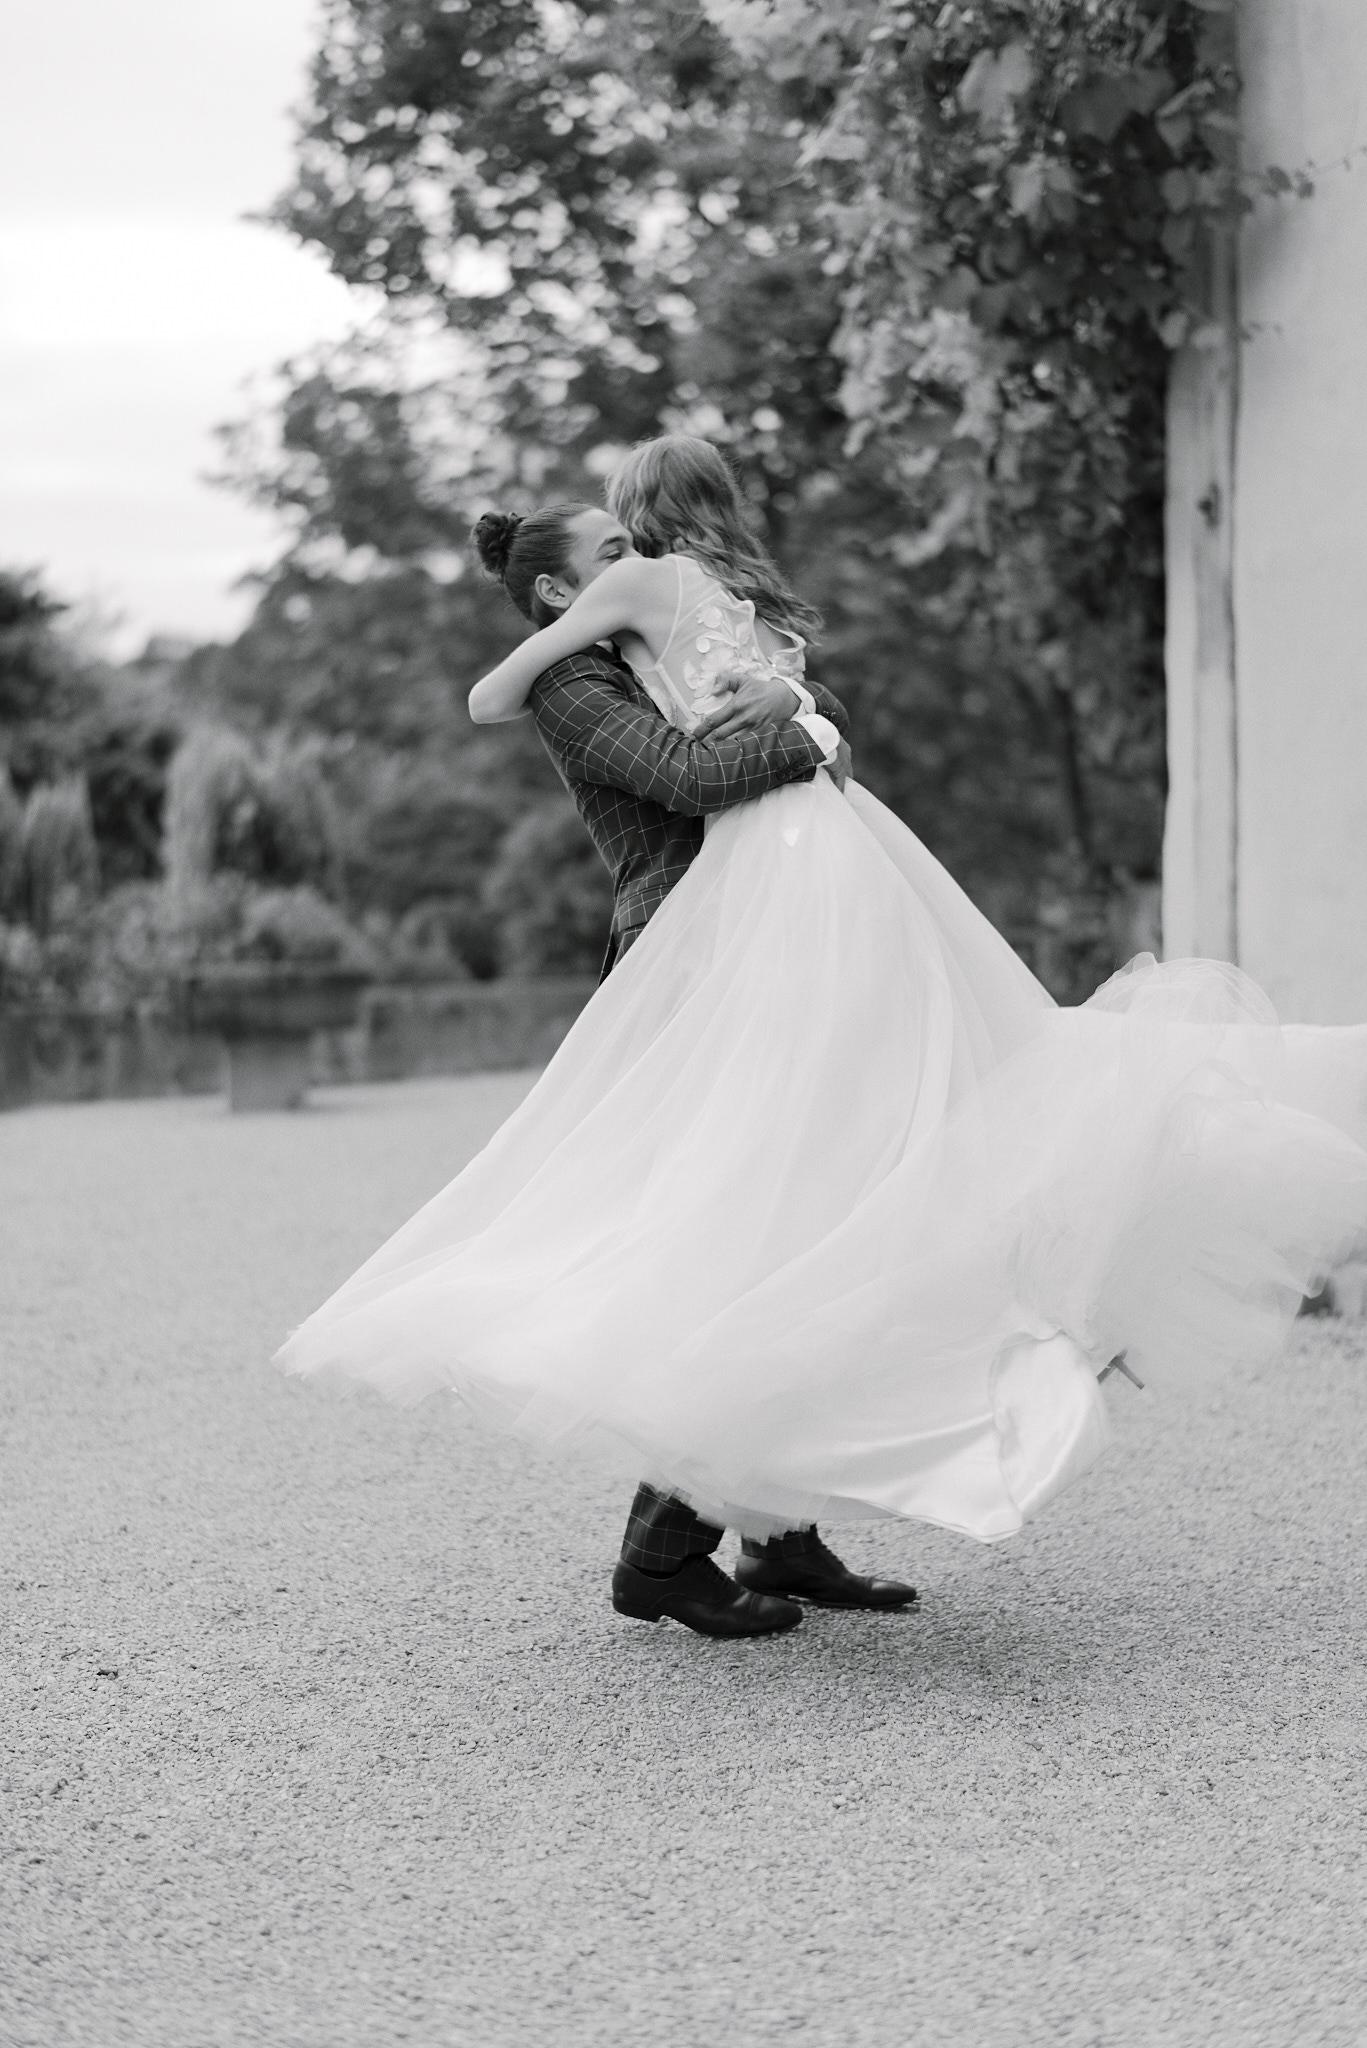 Sephory Photography - Romance is not dead 023 - Web.jpg